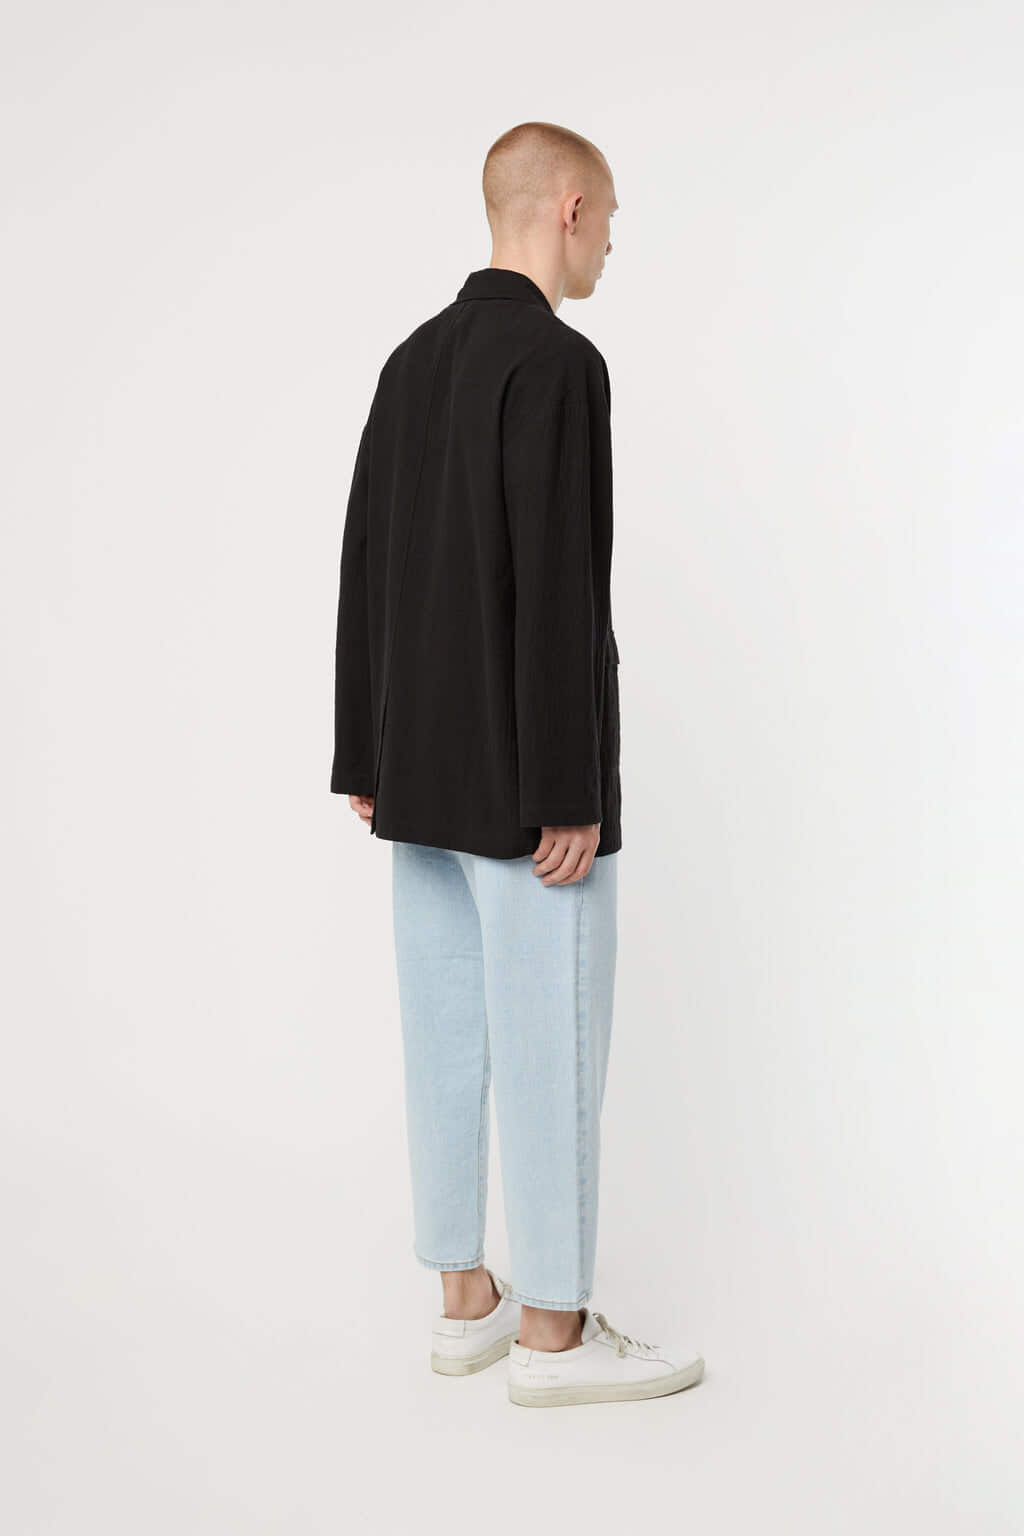 Jacket 3508 Black 10